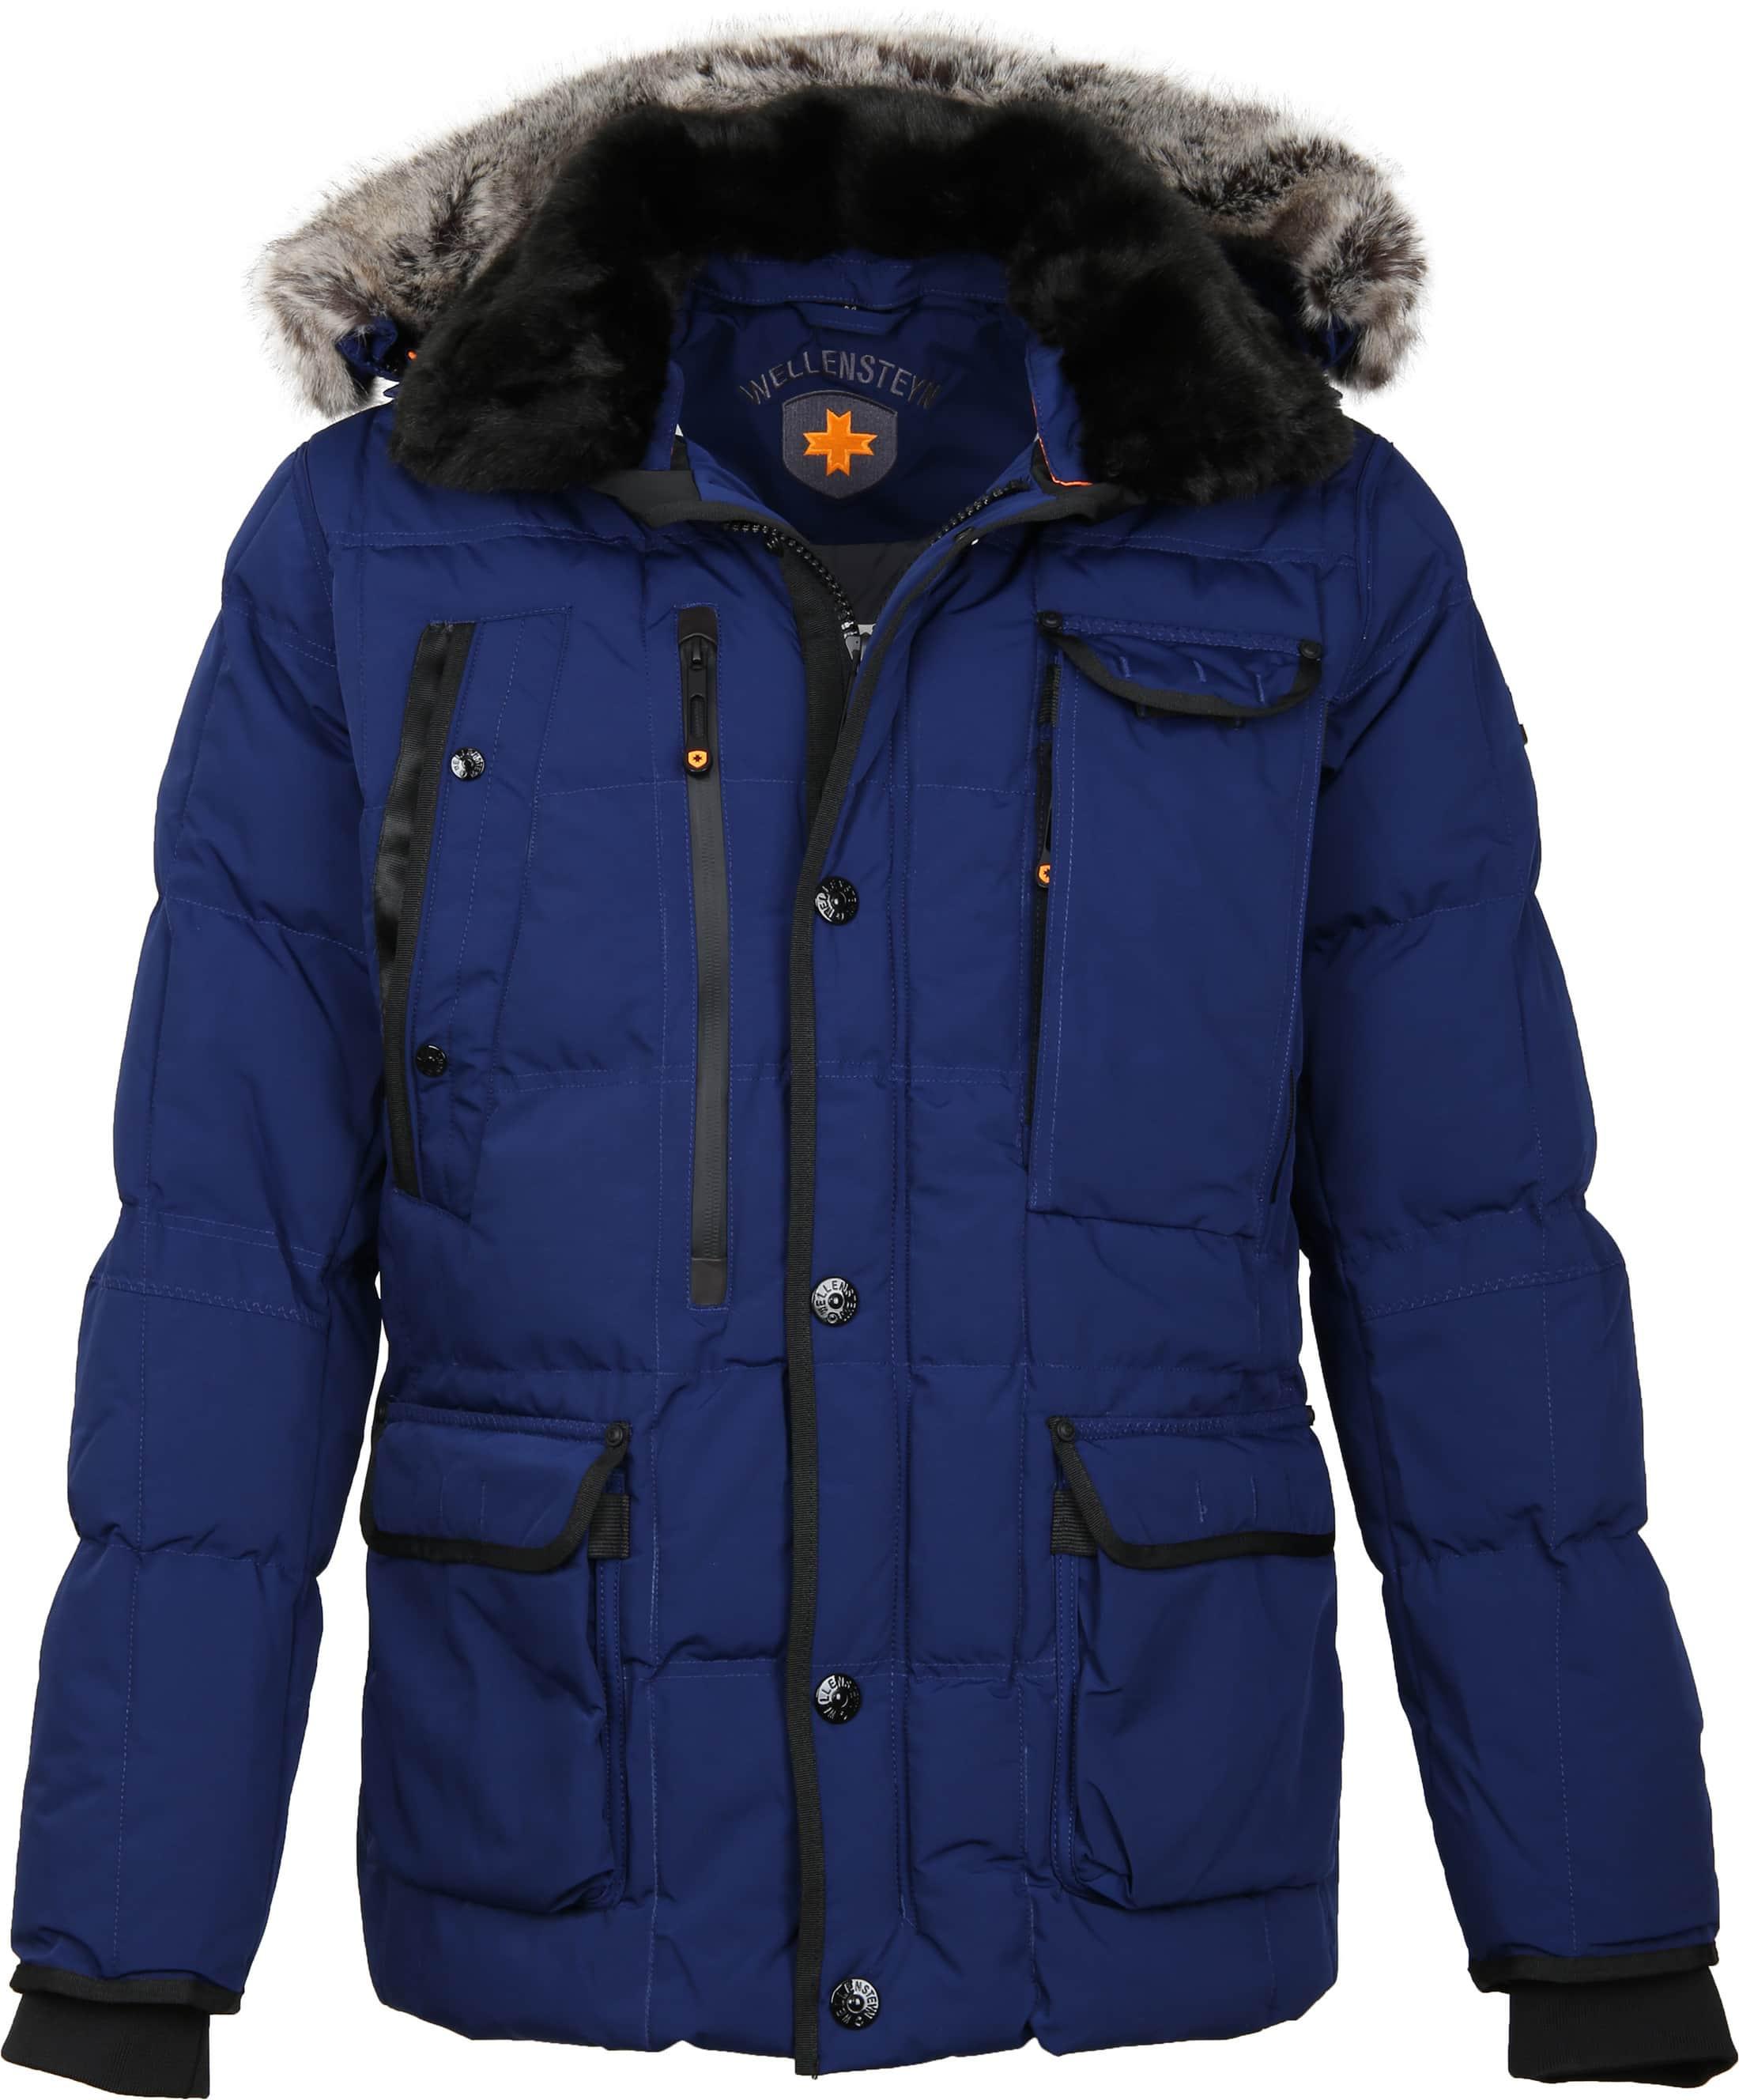 Wellensteyn Marvelous Jacket Blue foto 0